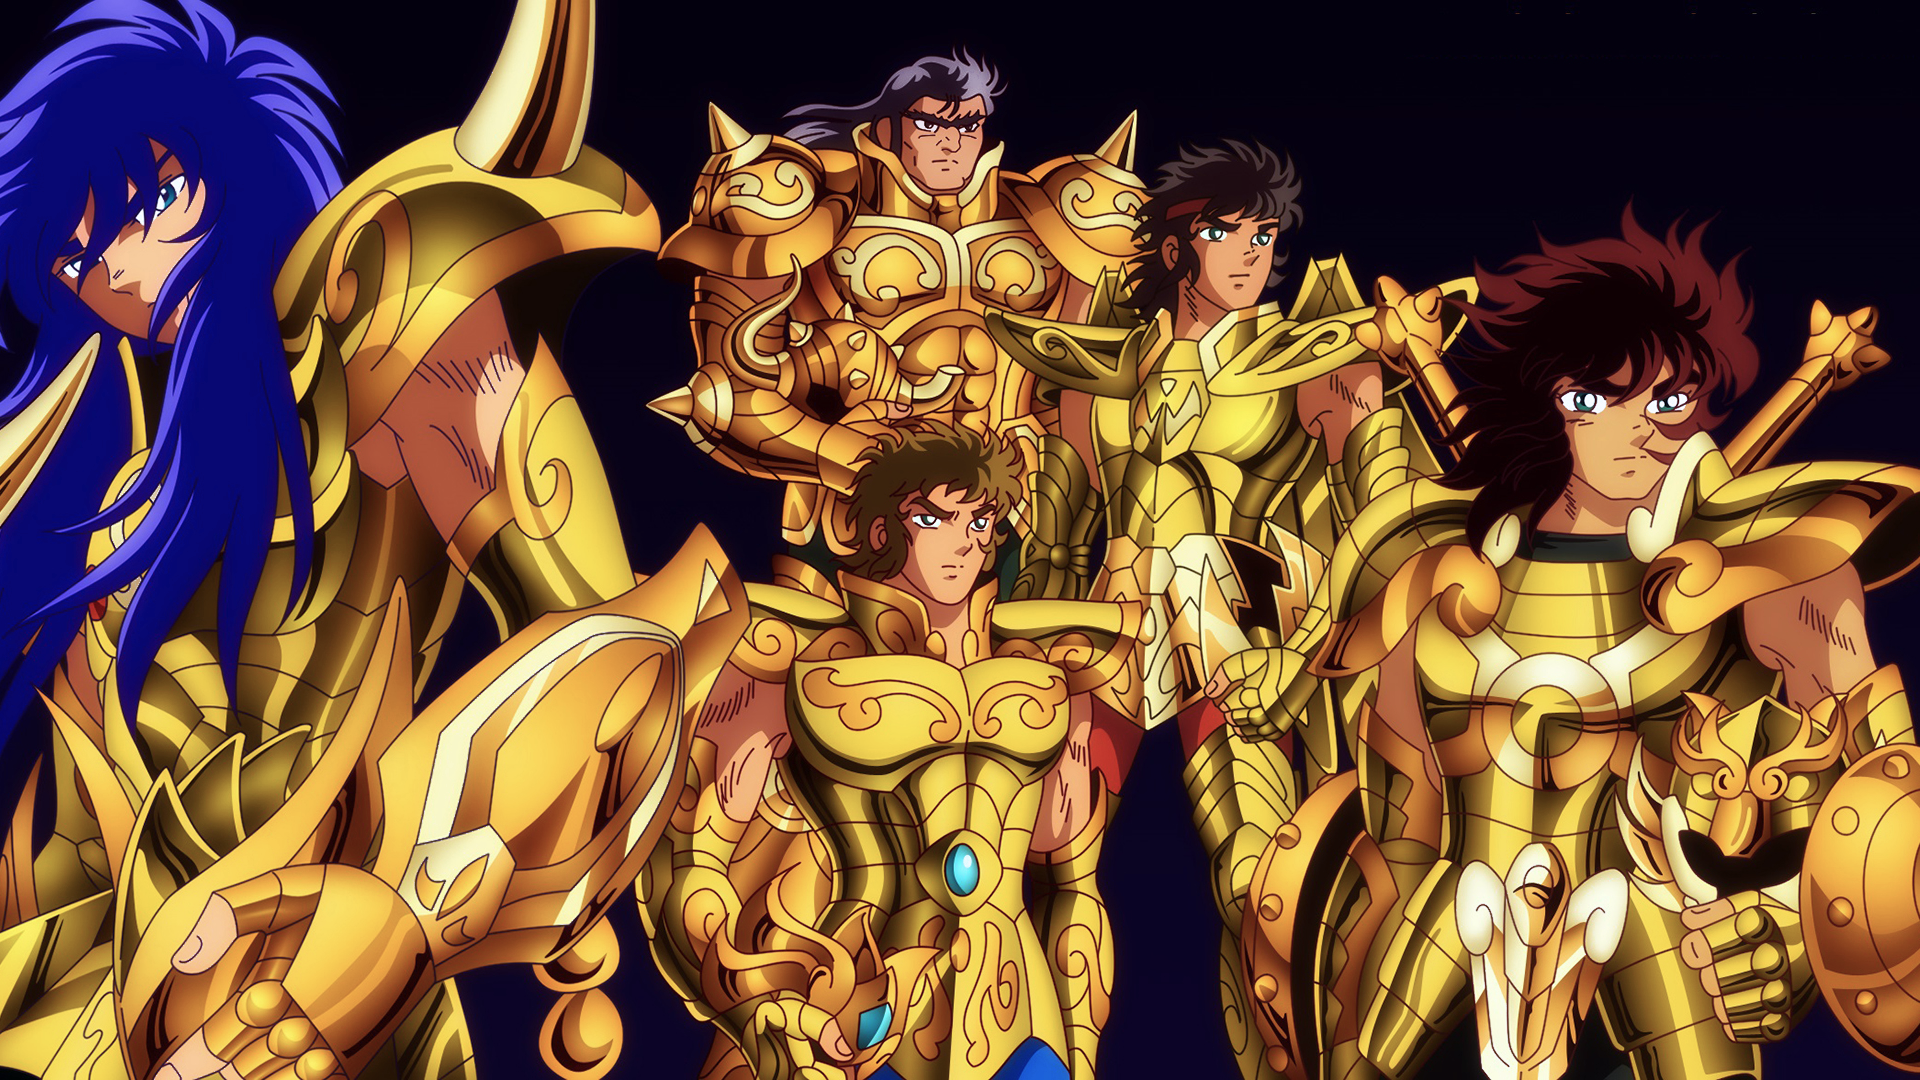 Golden Saints 3 Hd Wallpaper Background Image 1920x1080 Id